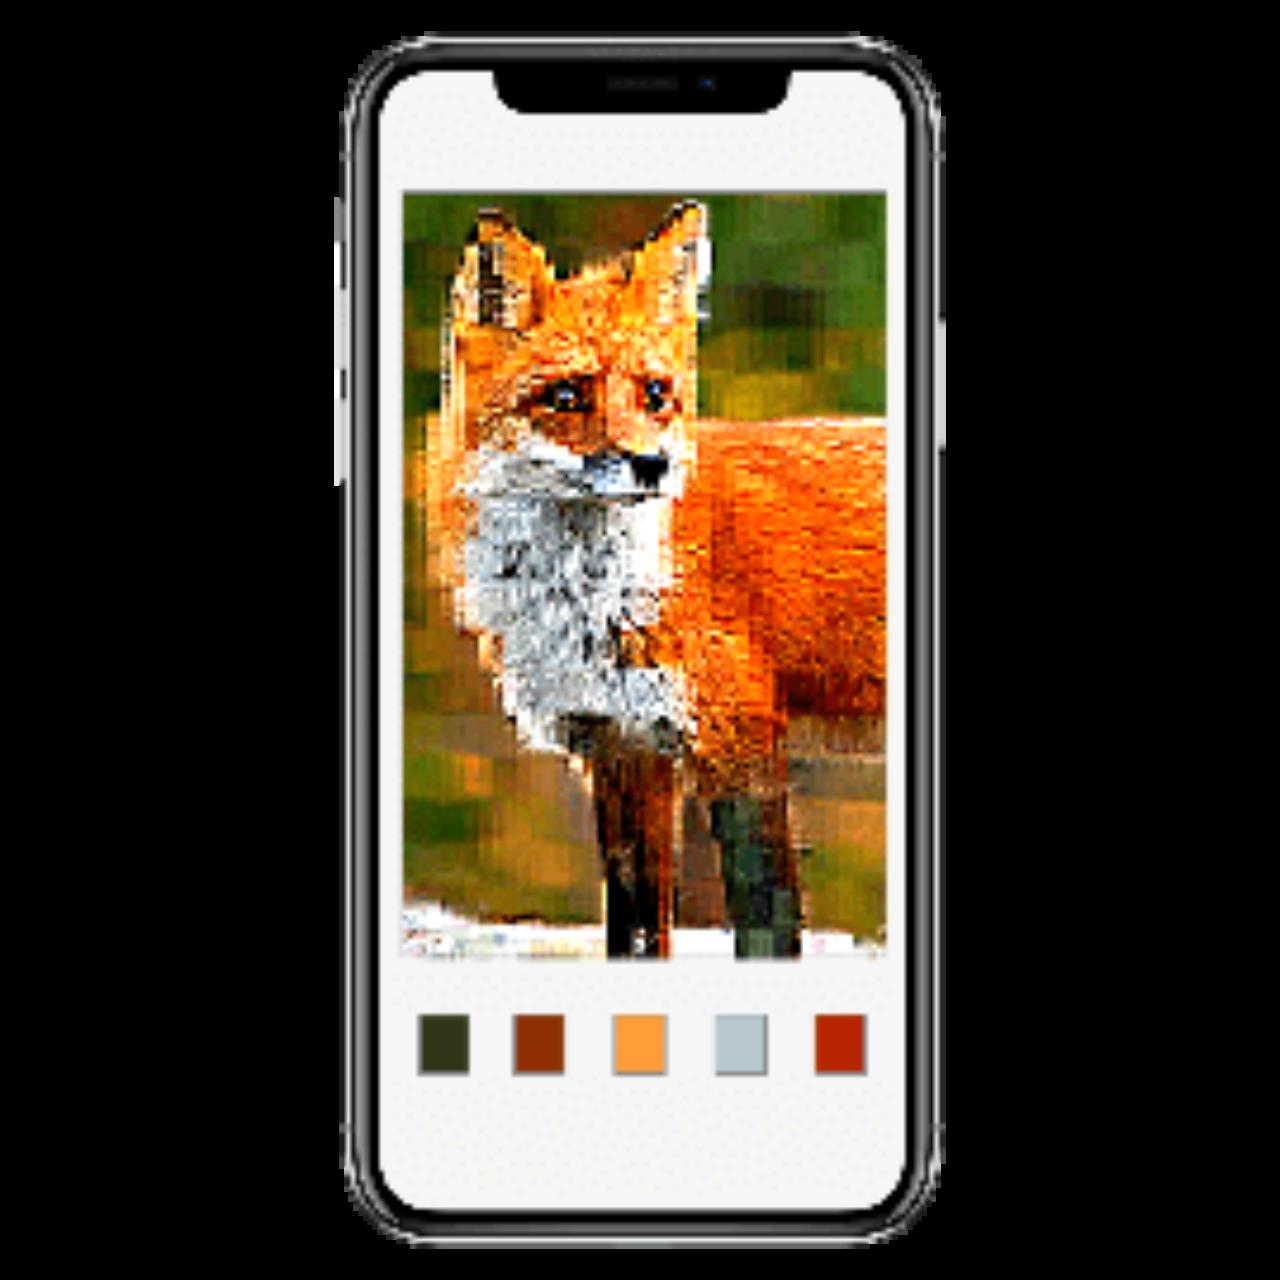 Coloring book app - fox